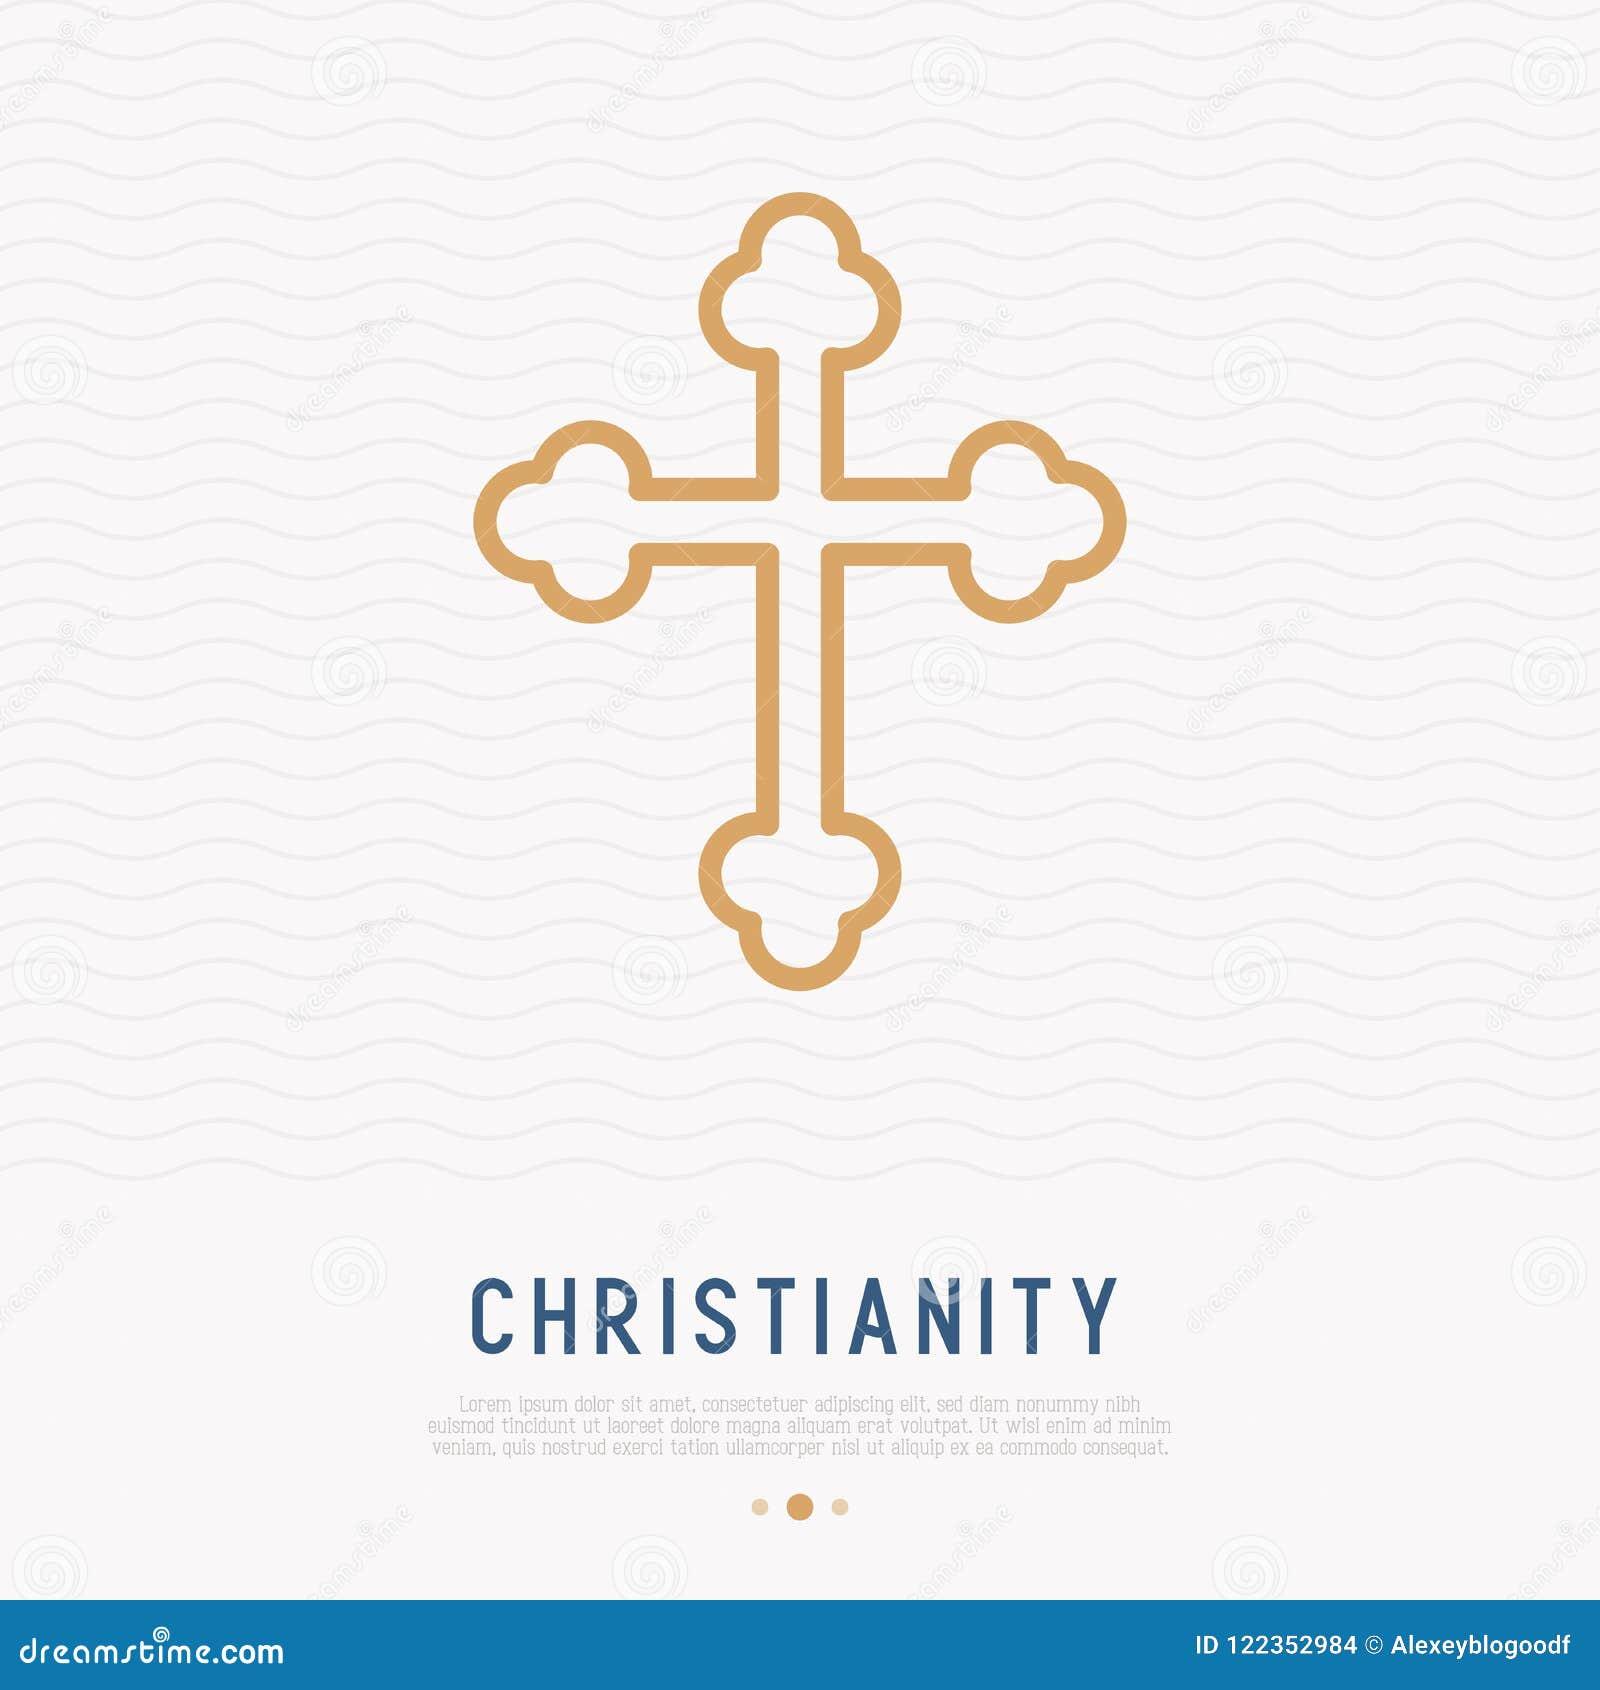 Línea fina cruzada cristiana icono